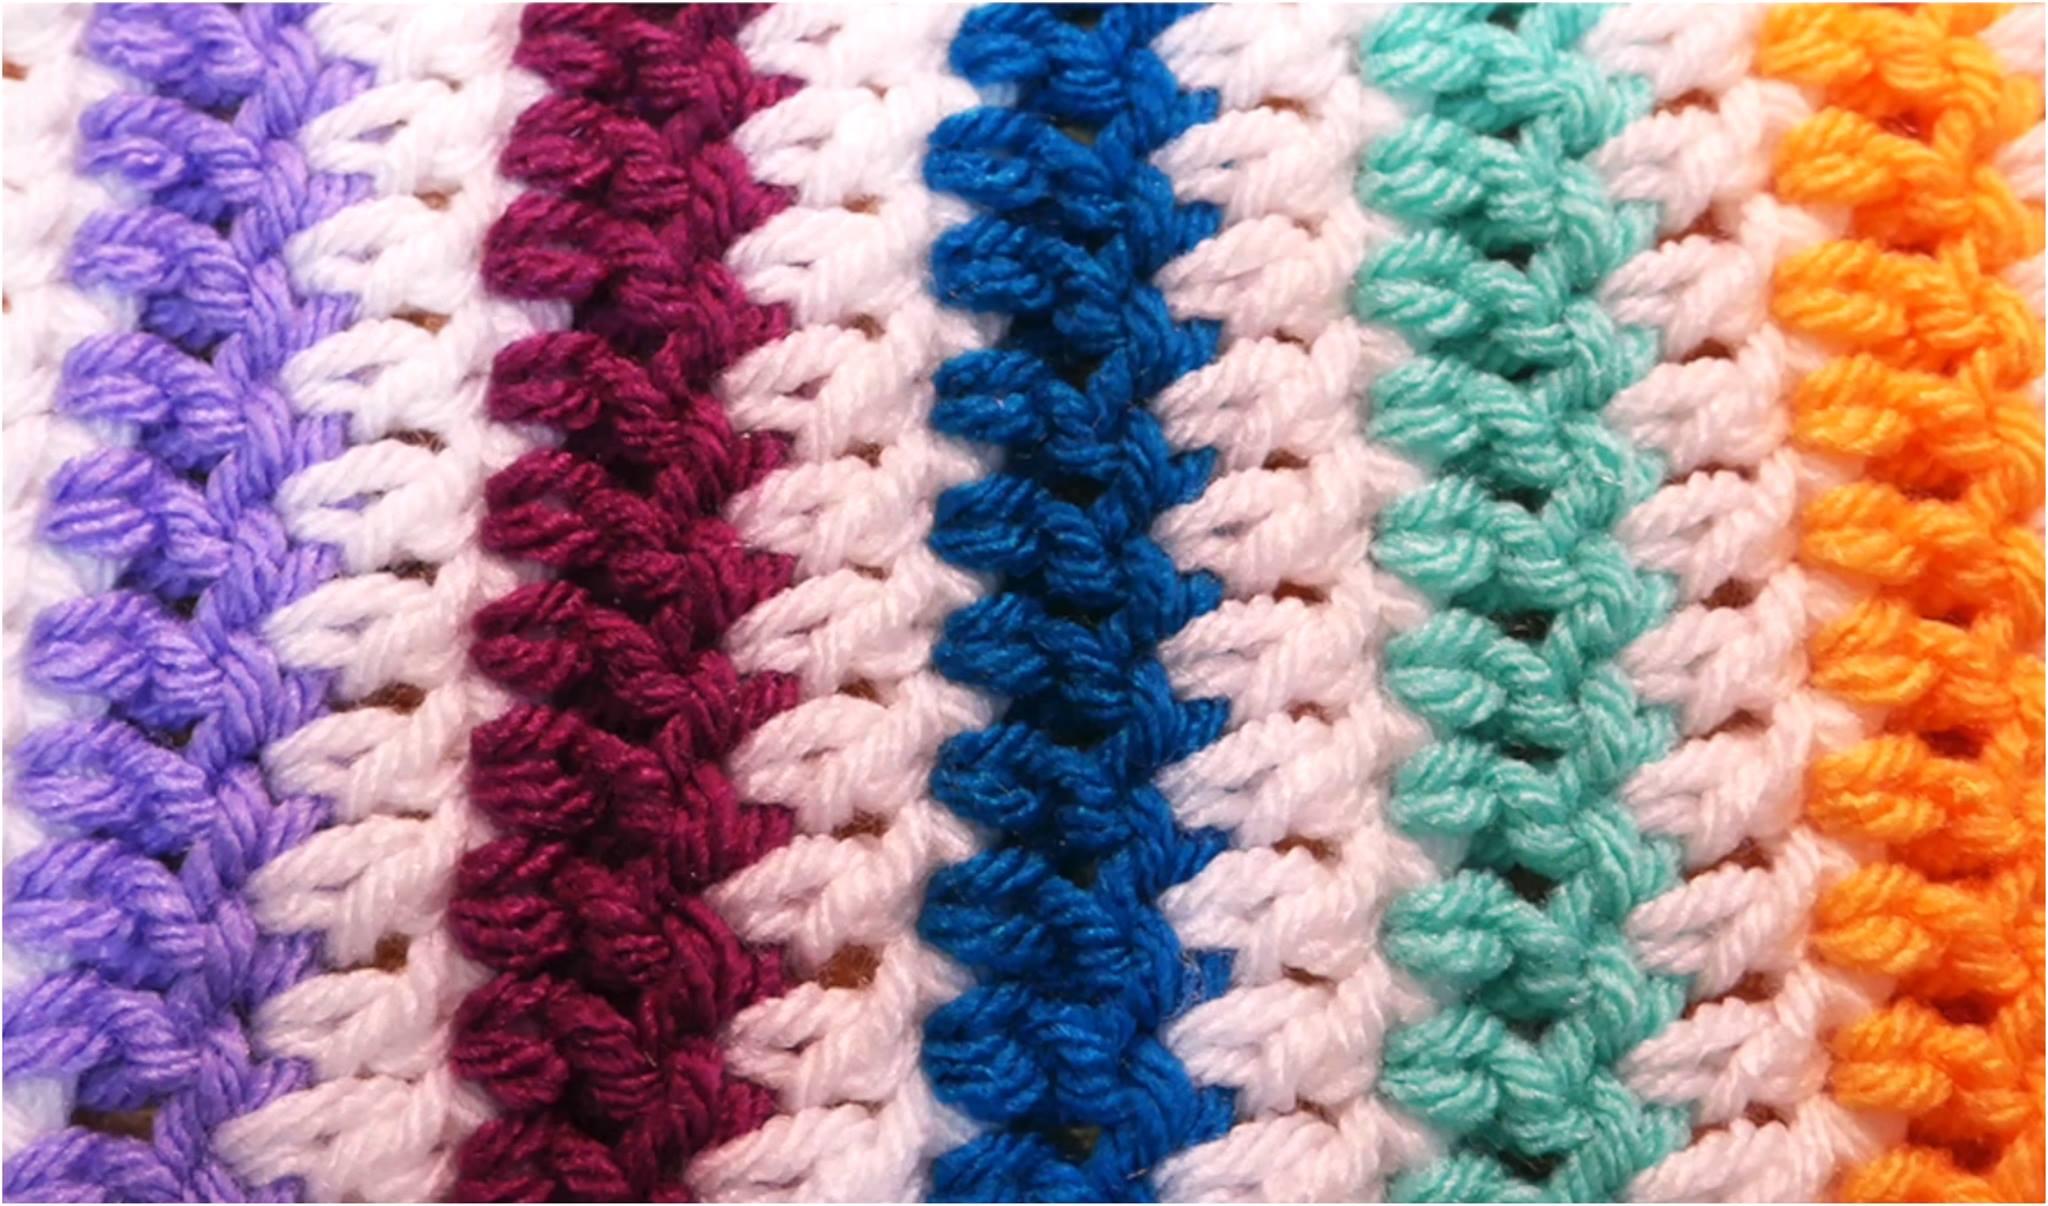 Crochet Rainbow Stripes Blanket/Scarf